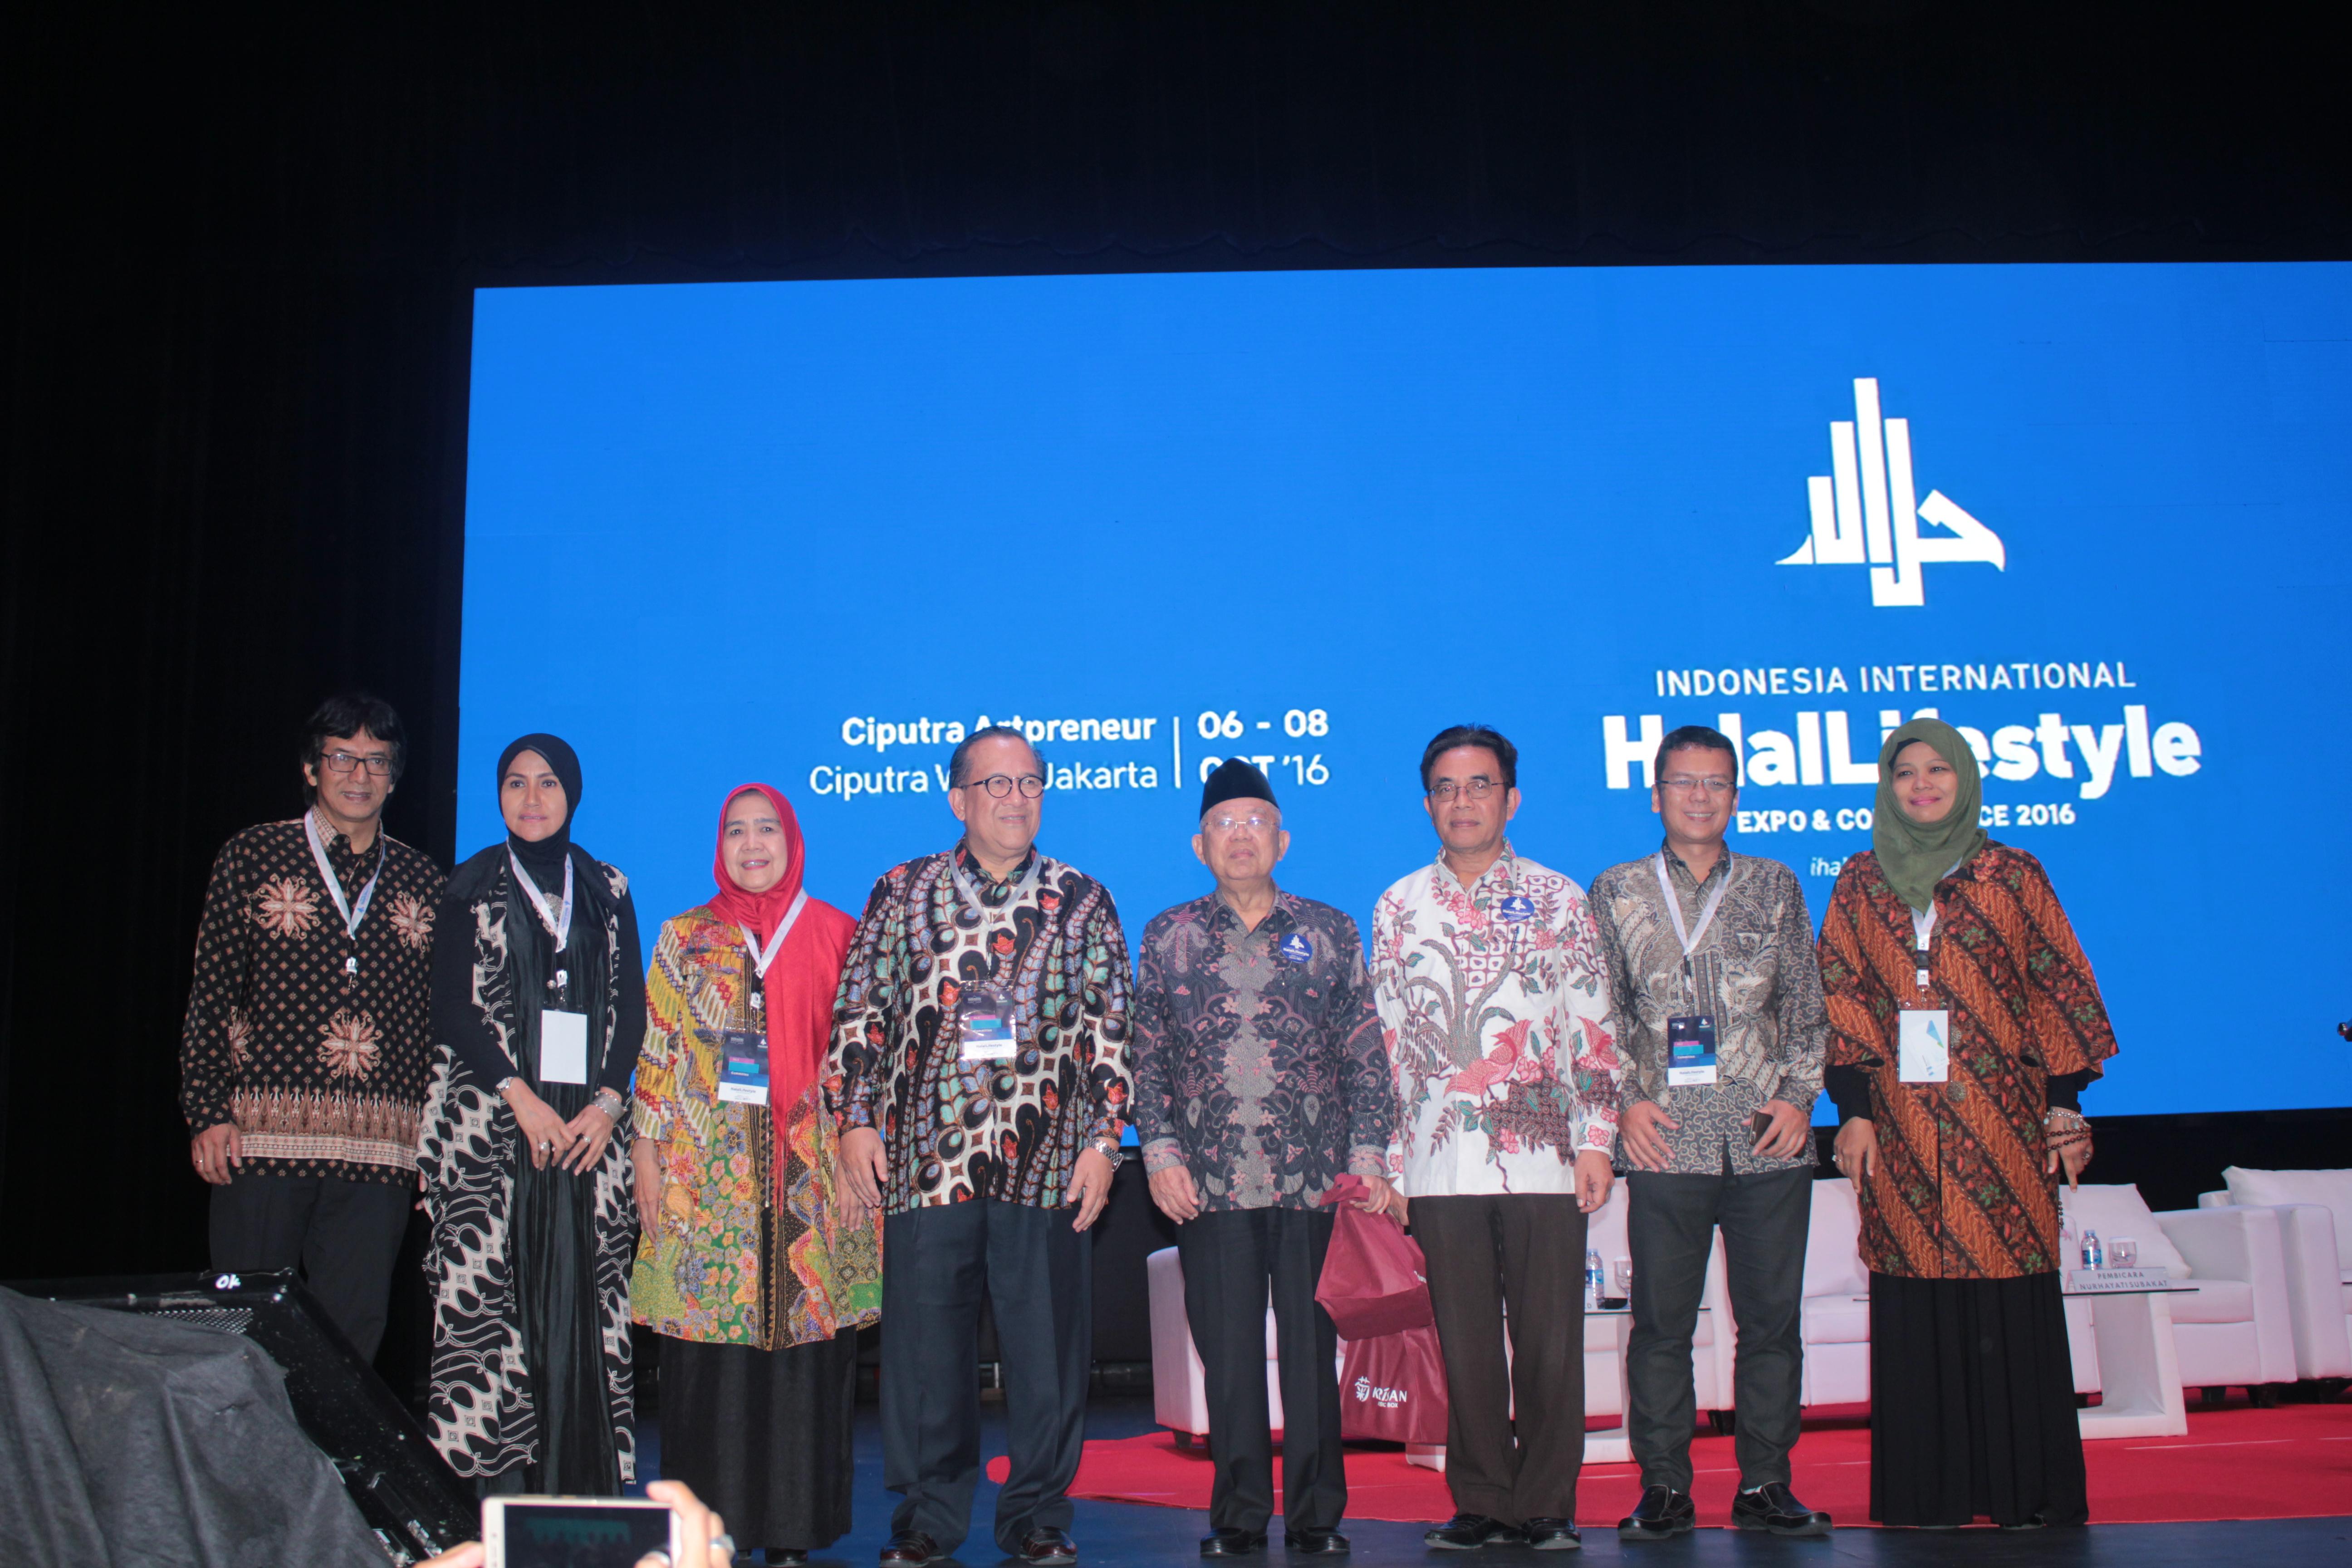 Ketua Umum MUI Buka Acara Halal Lifestyle